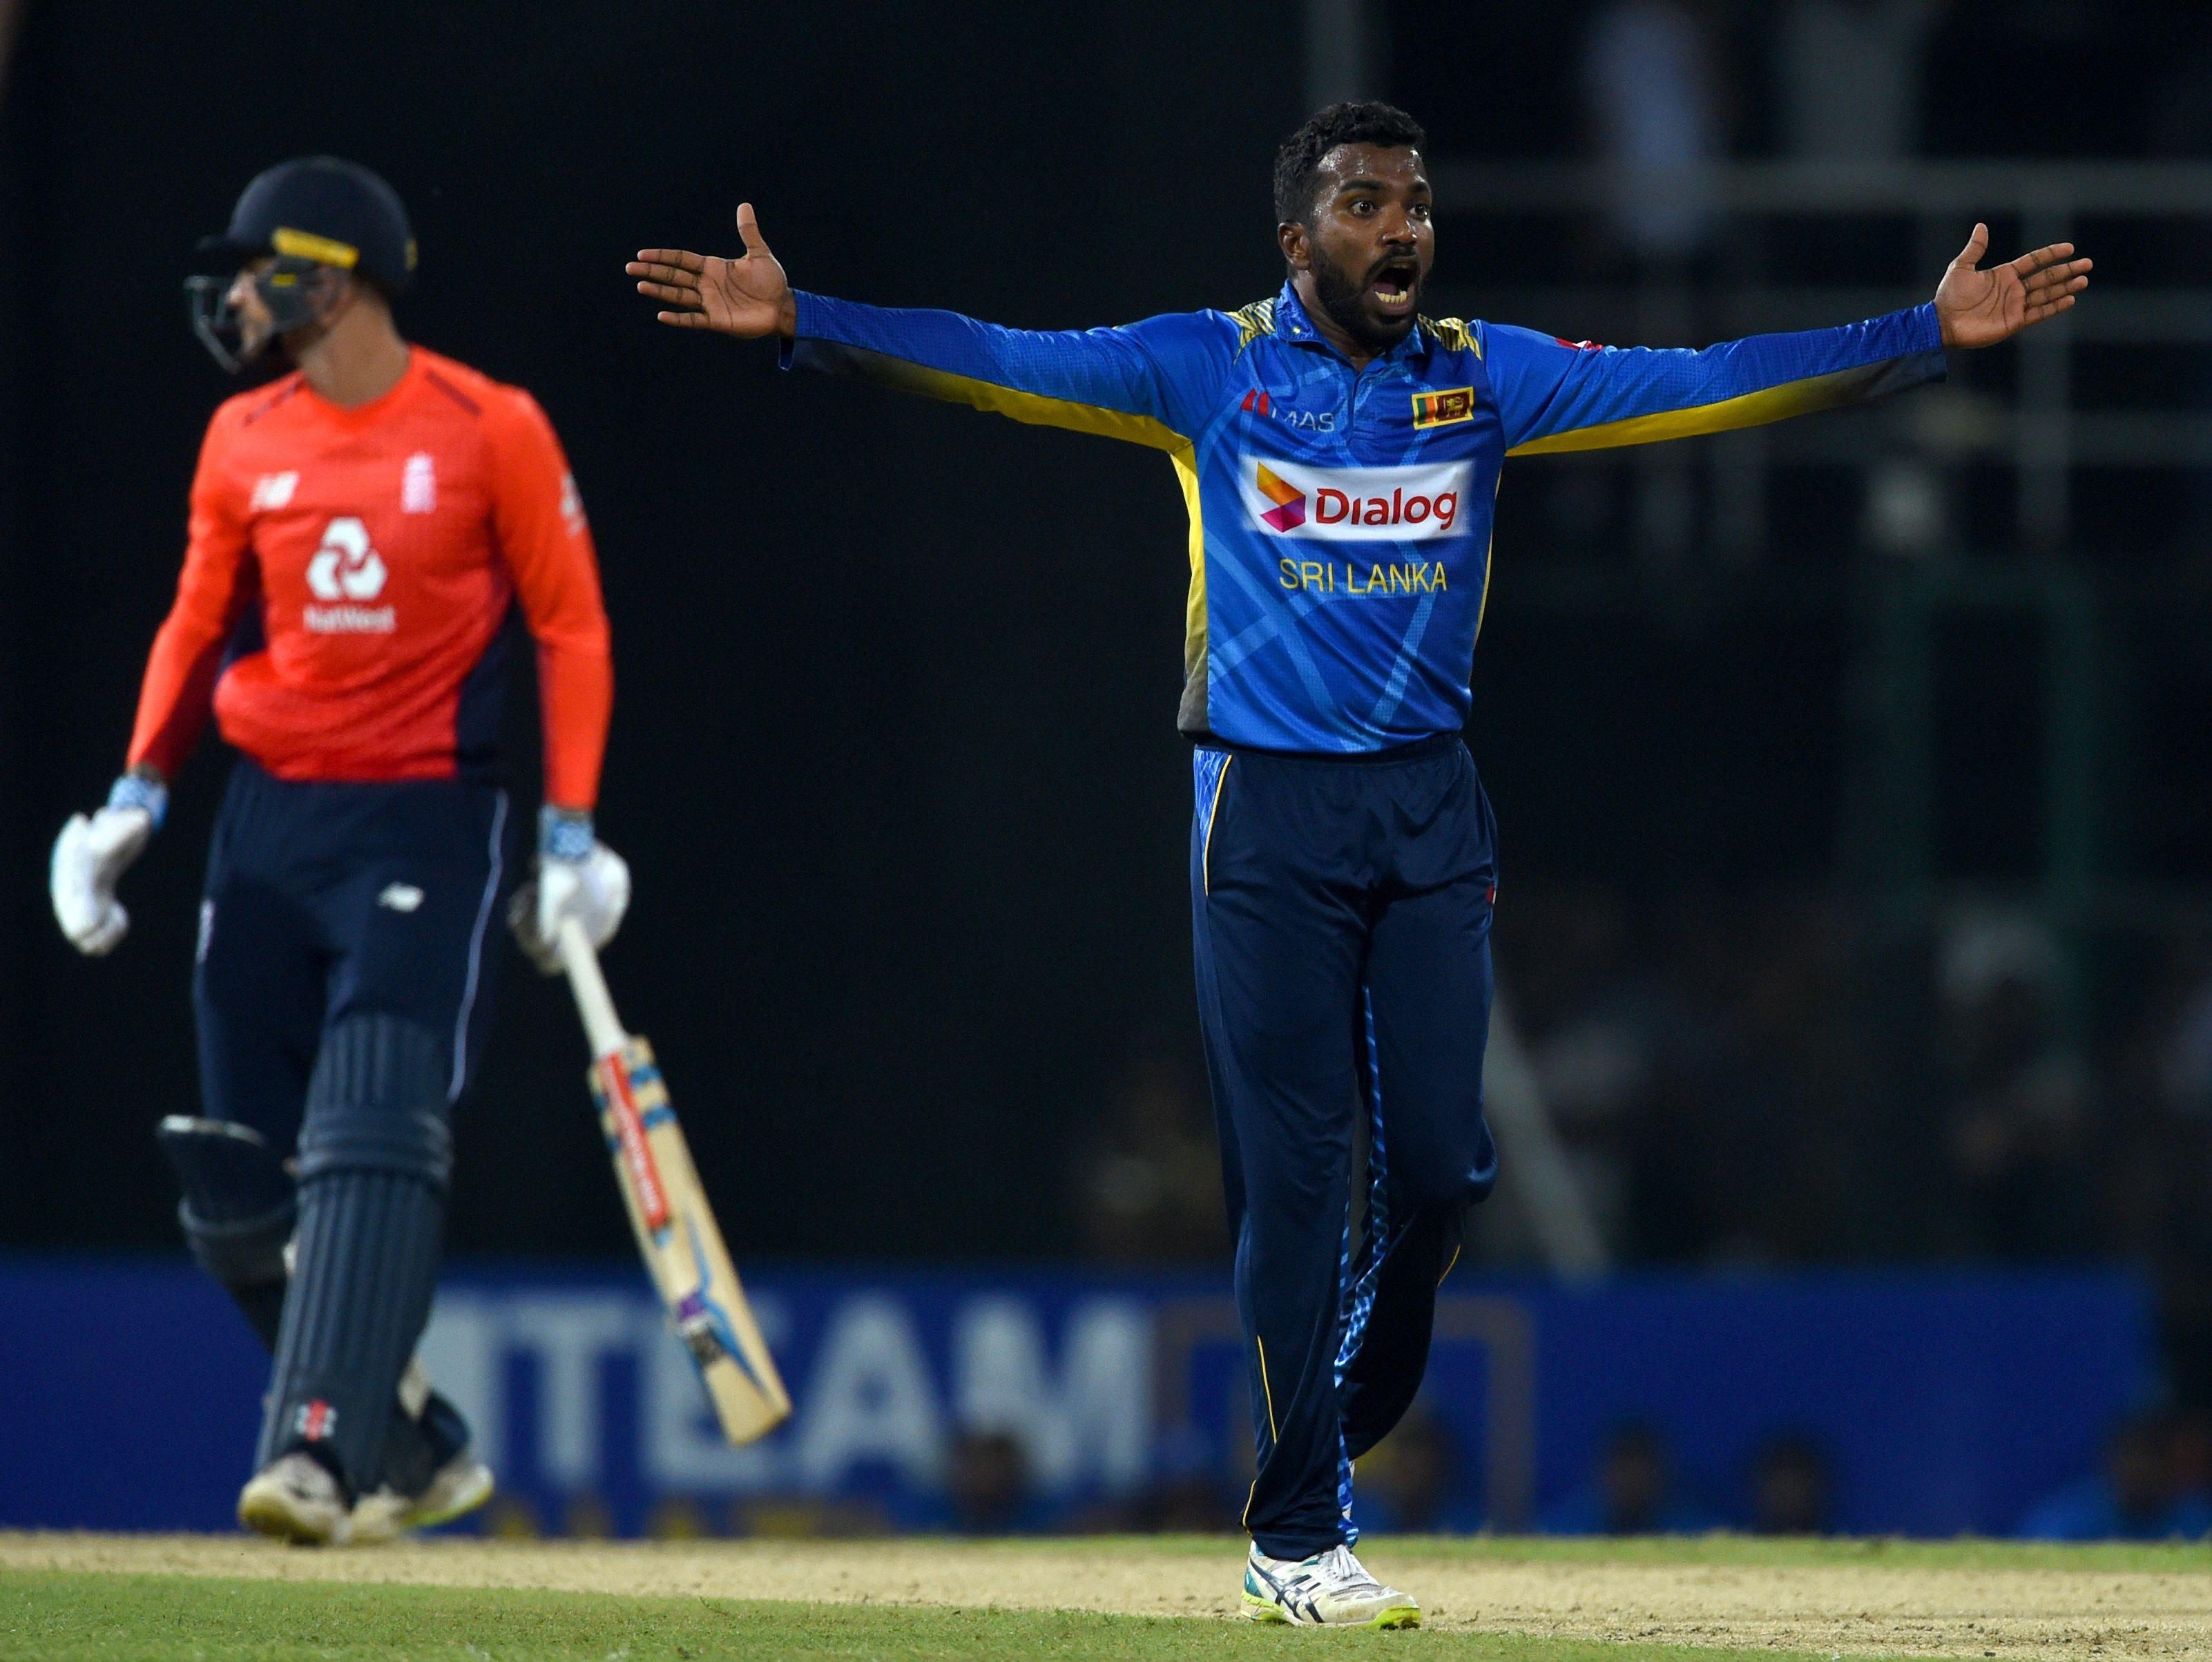 Sri Lanka's Amila Aponso celebrates after he dismissed Alex Hales at the R.Peremadasa Stadium